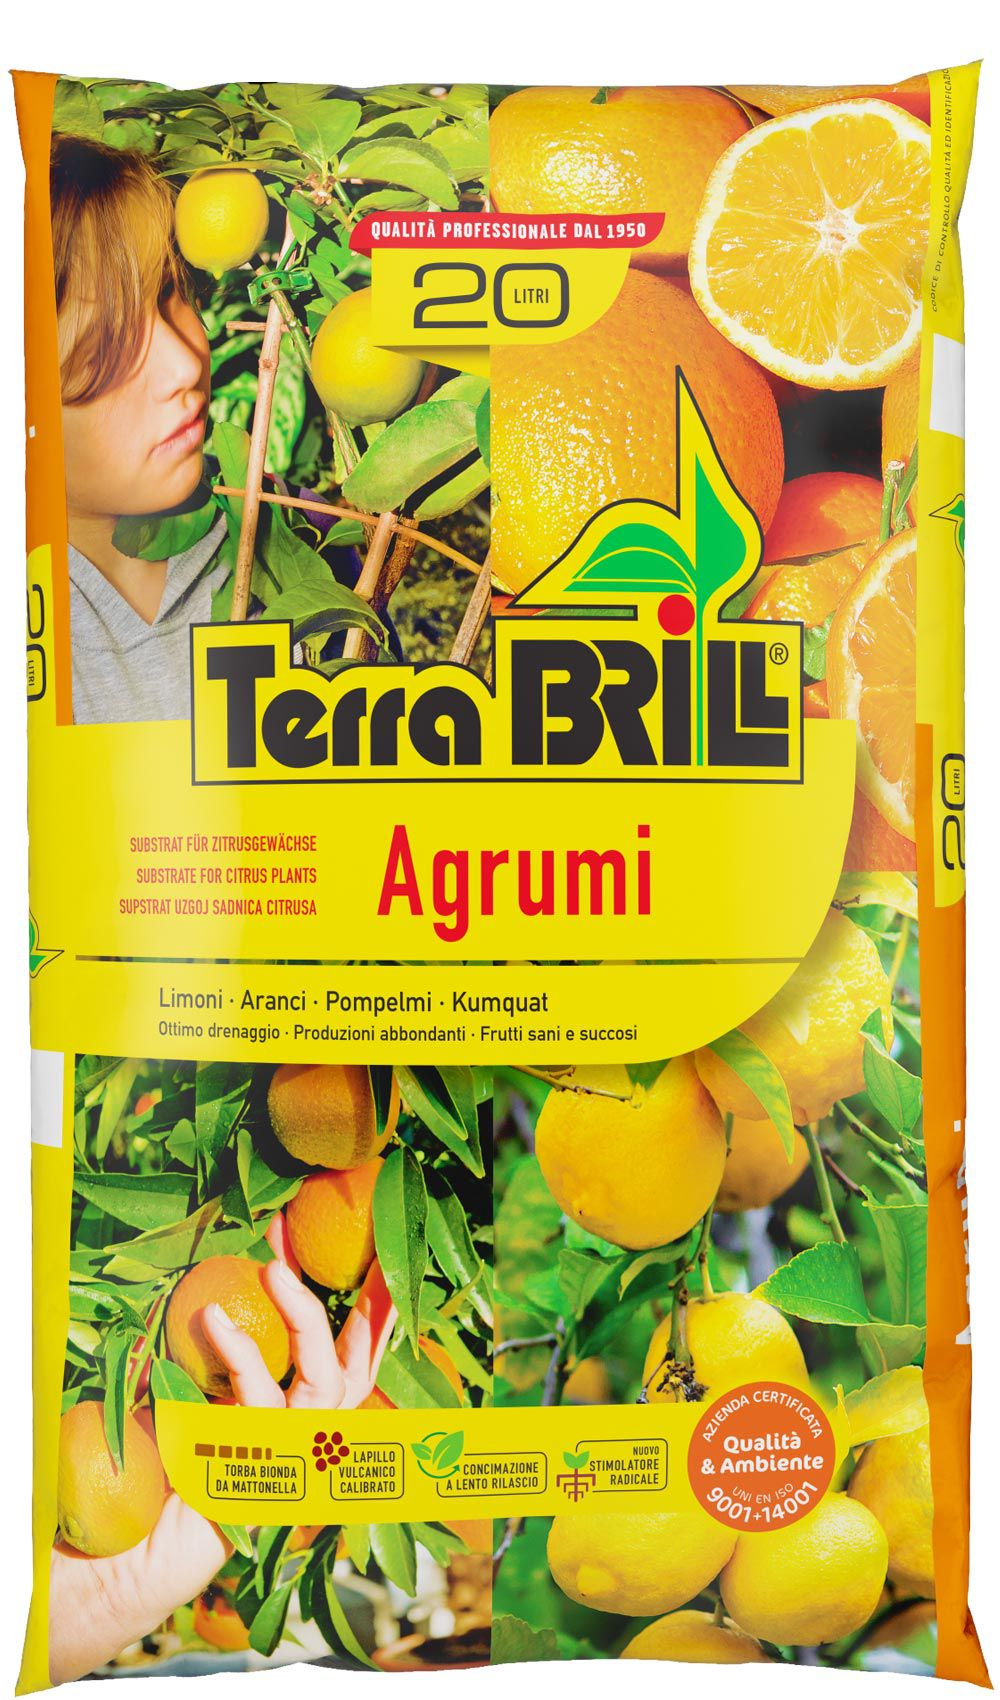 TerraBrill® Agrumi